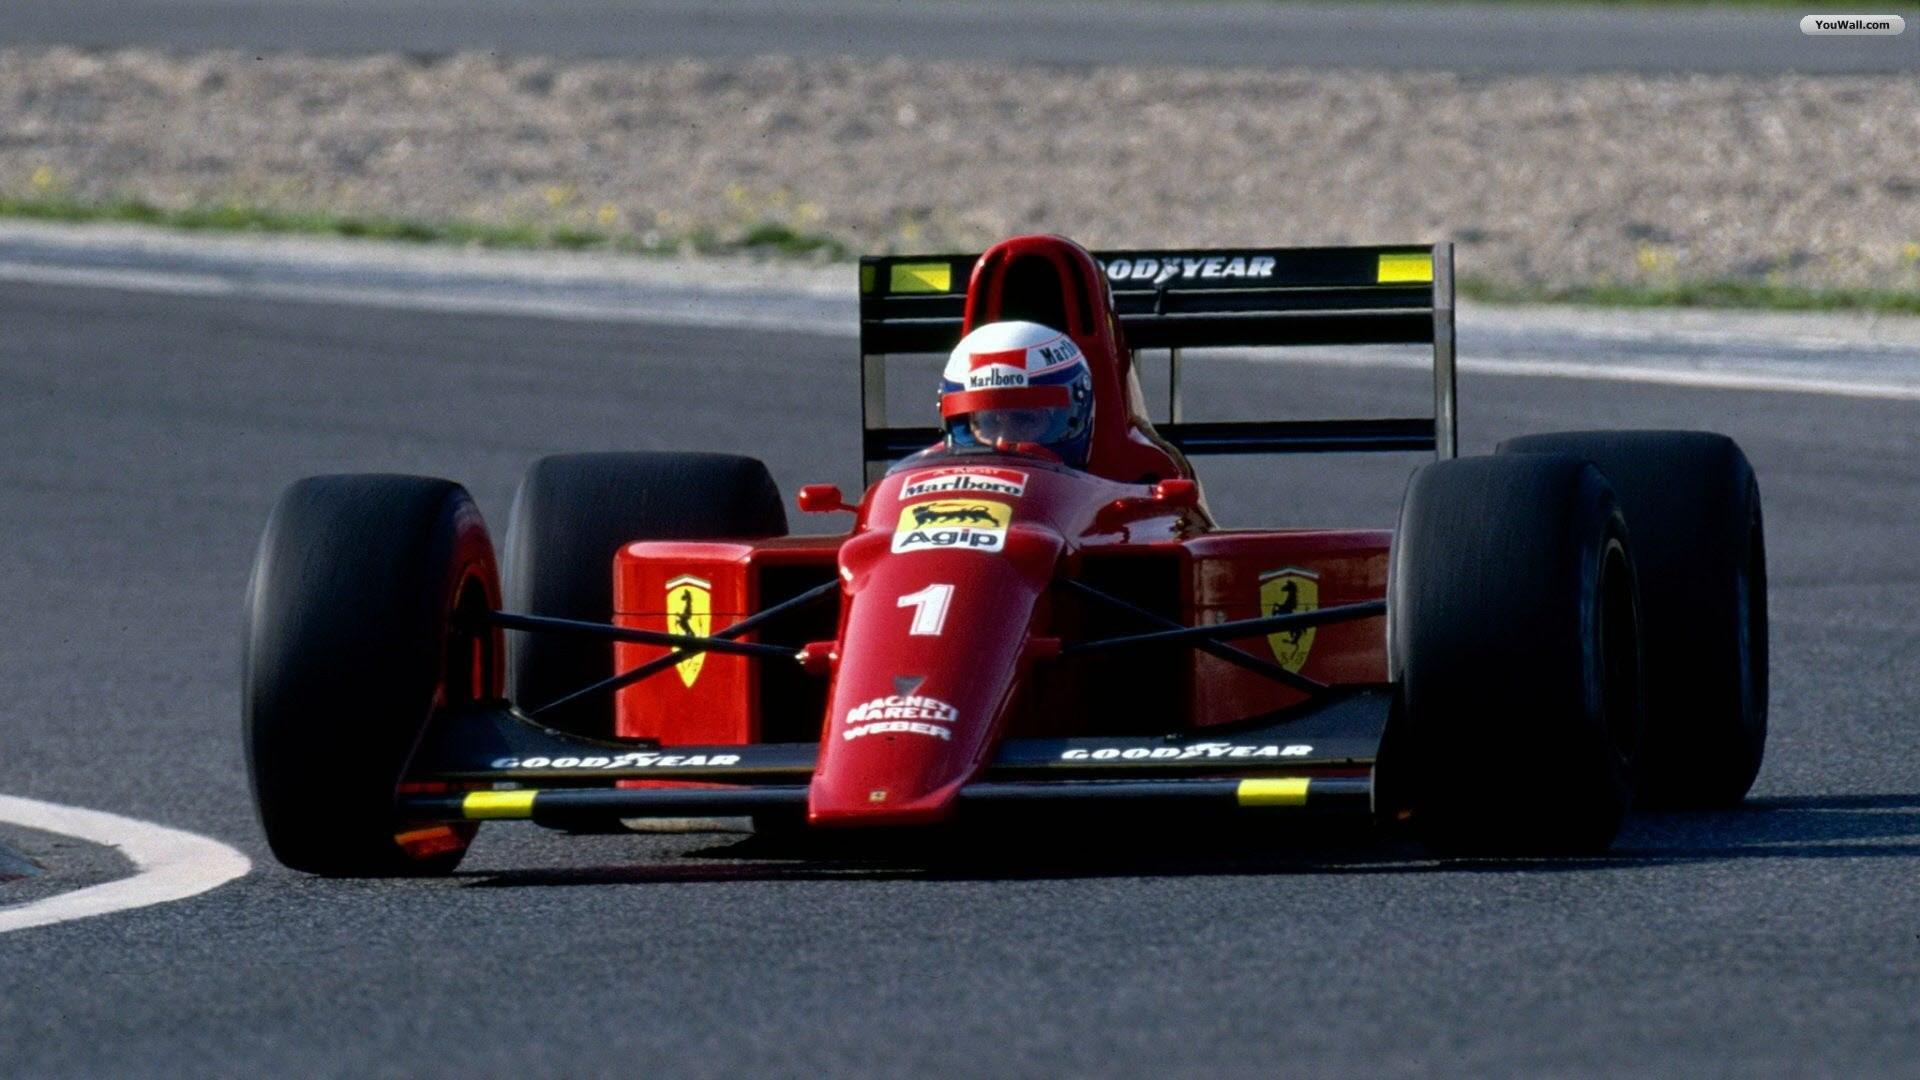 F1 Wallpaper (79+ immagini)